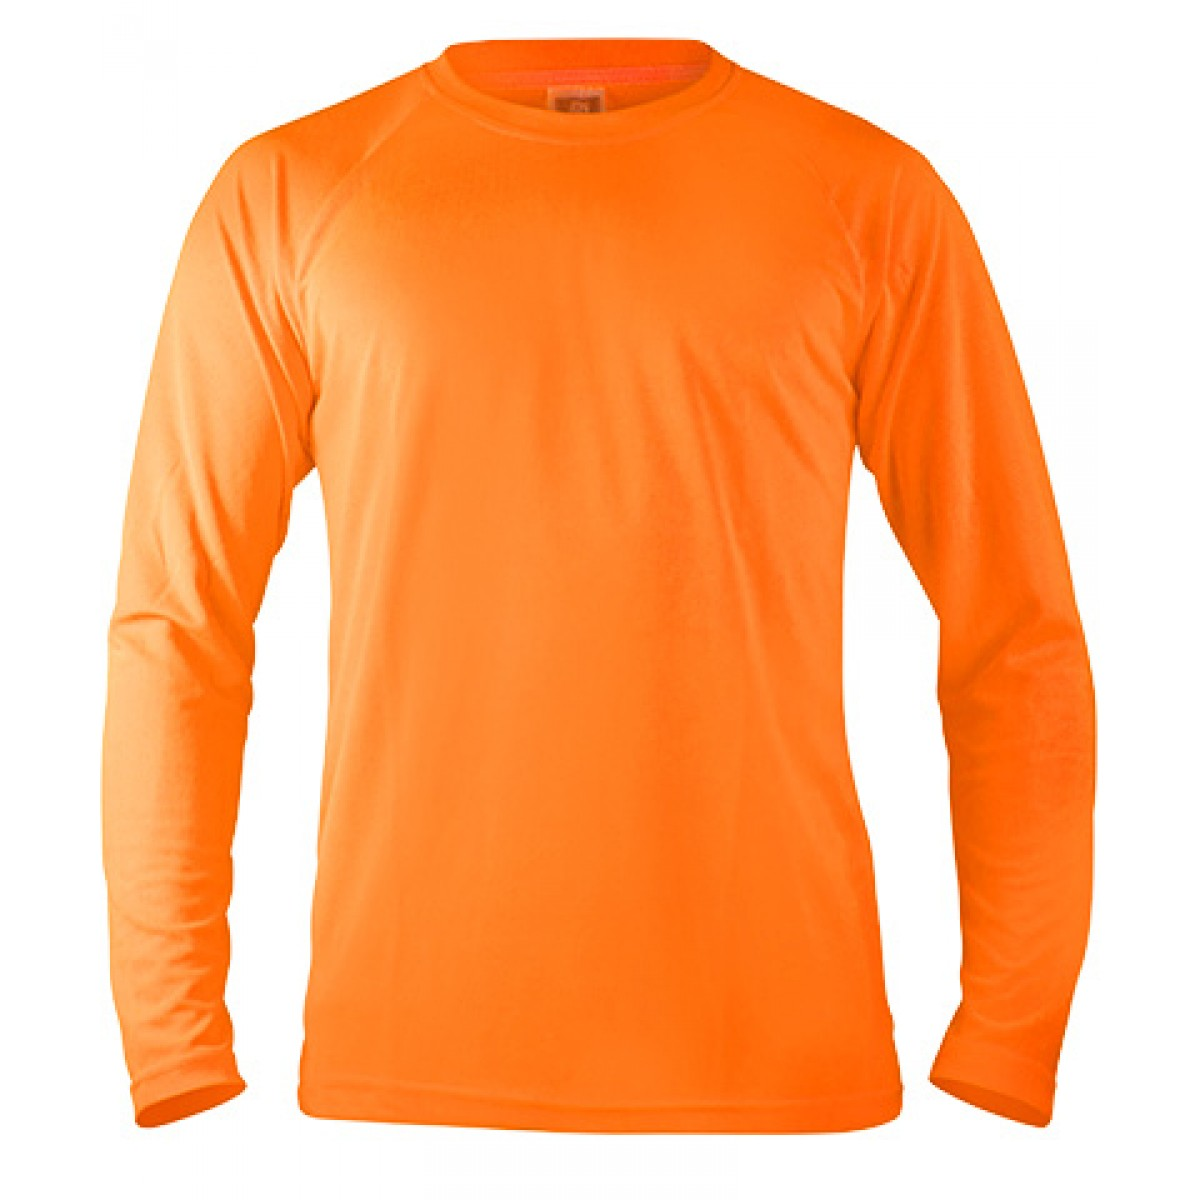 Long Sleeve Performance -Safety Orange-YL